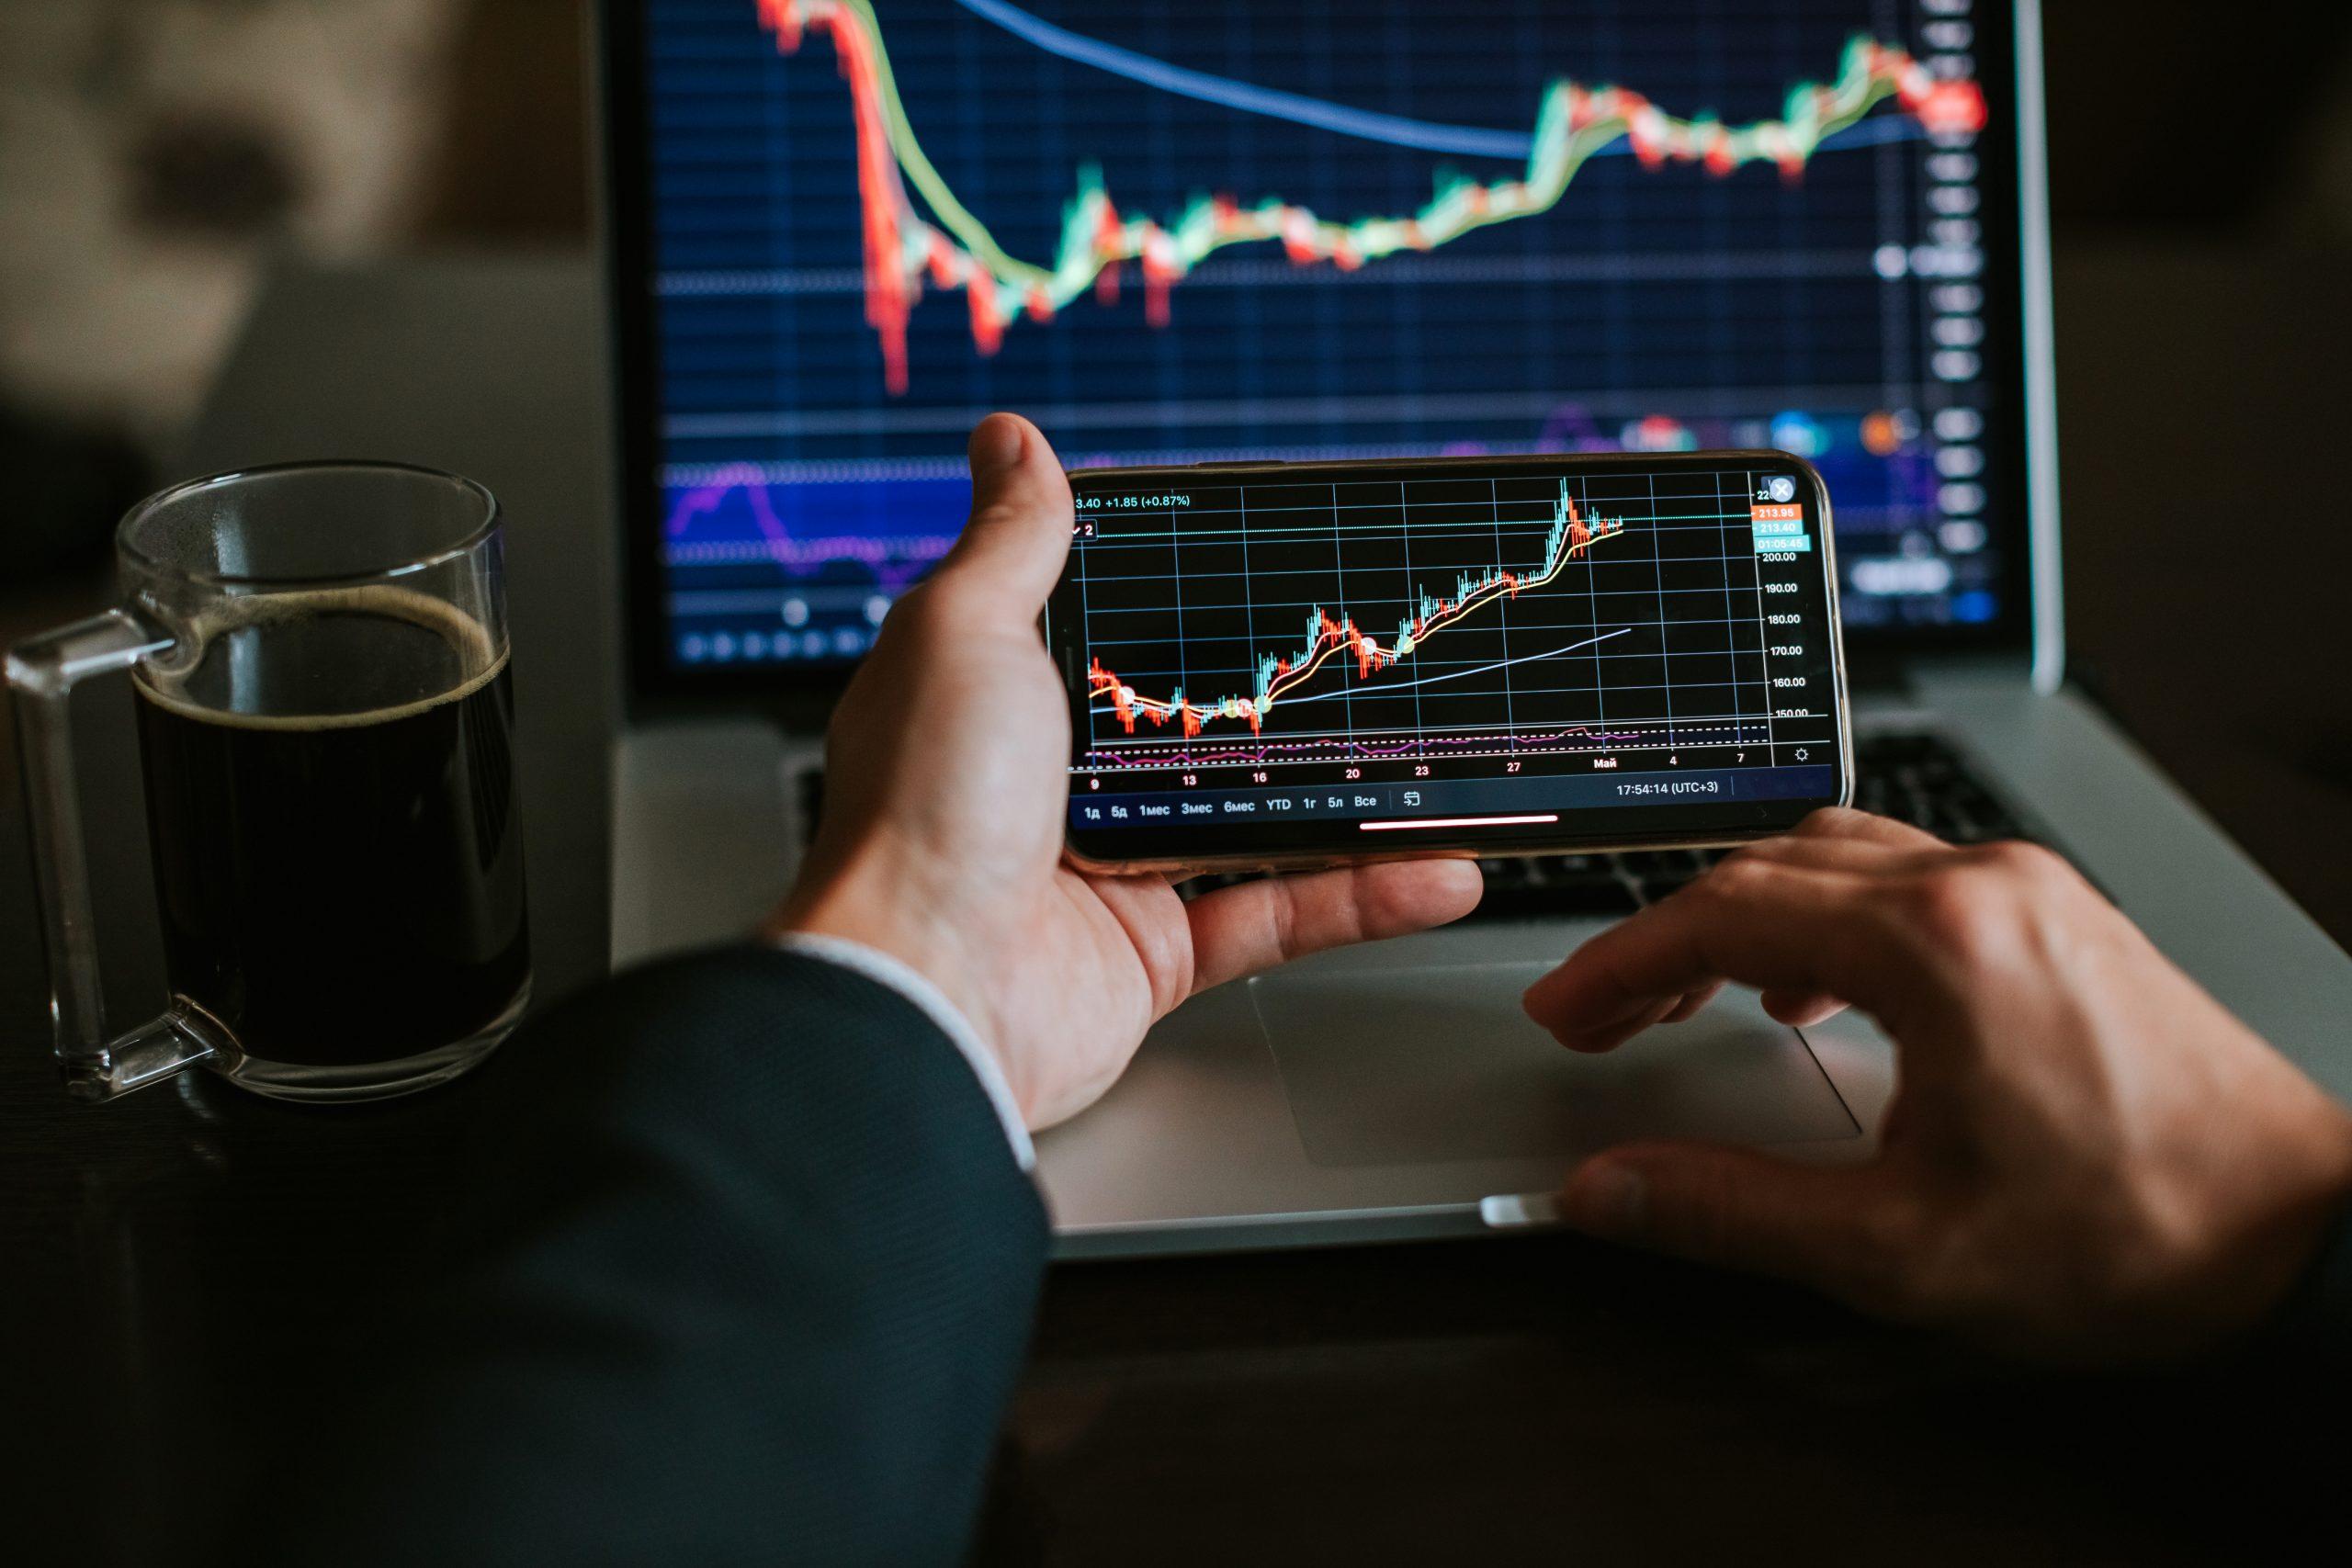 Banking Deal-Full Service Broker